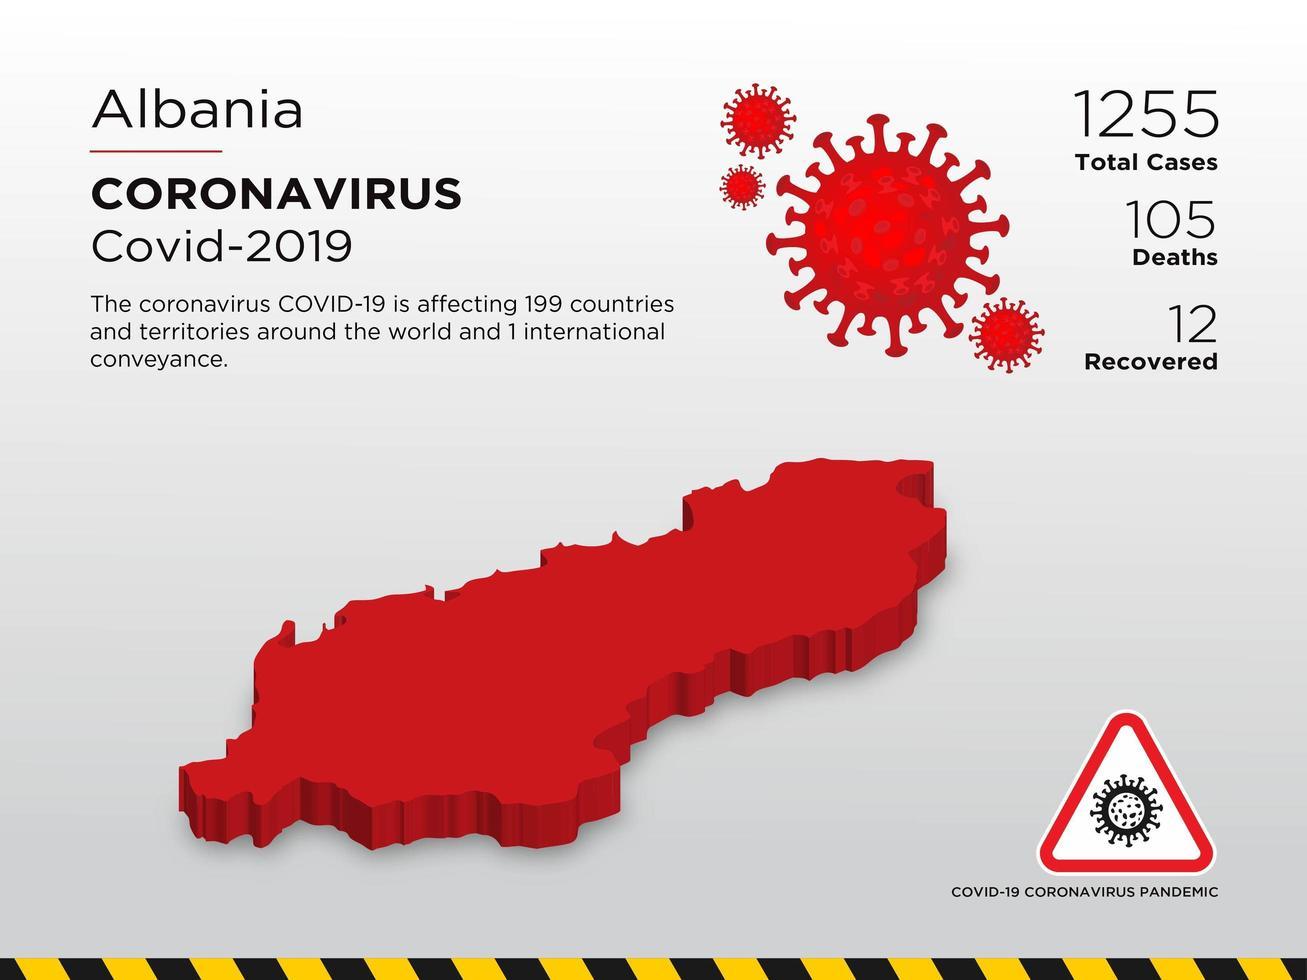 Albania Affected Country Map of Coronavirus Spread  vector